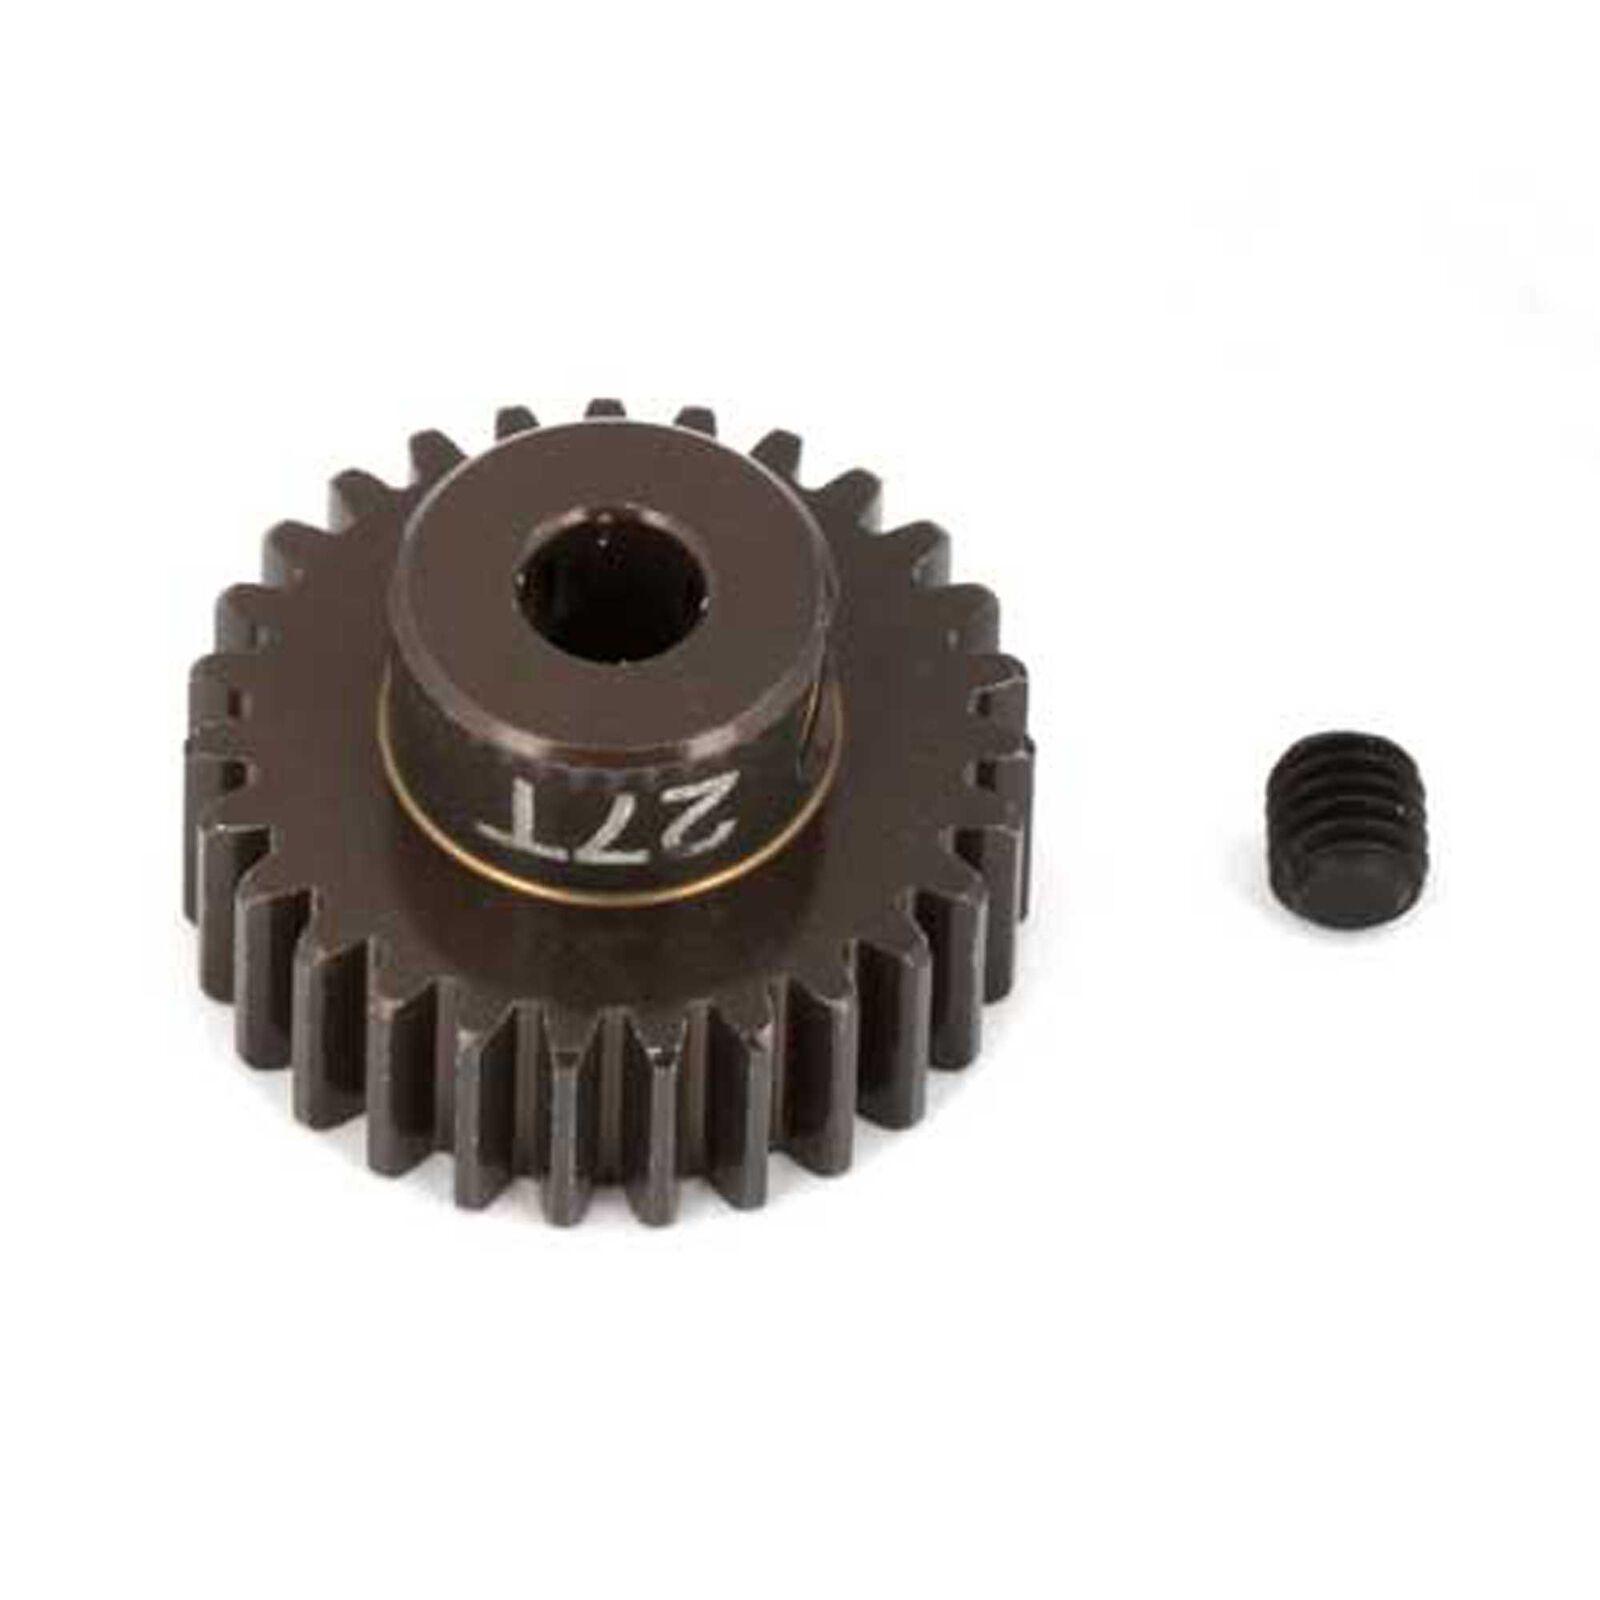 Factory Team Aluminum Pinion Gear, 27T, 48P, 1/8 shaft